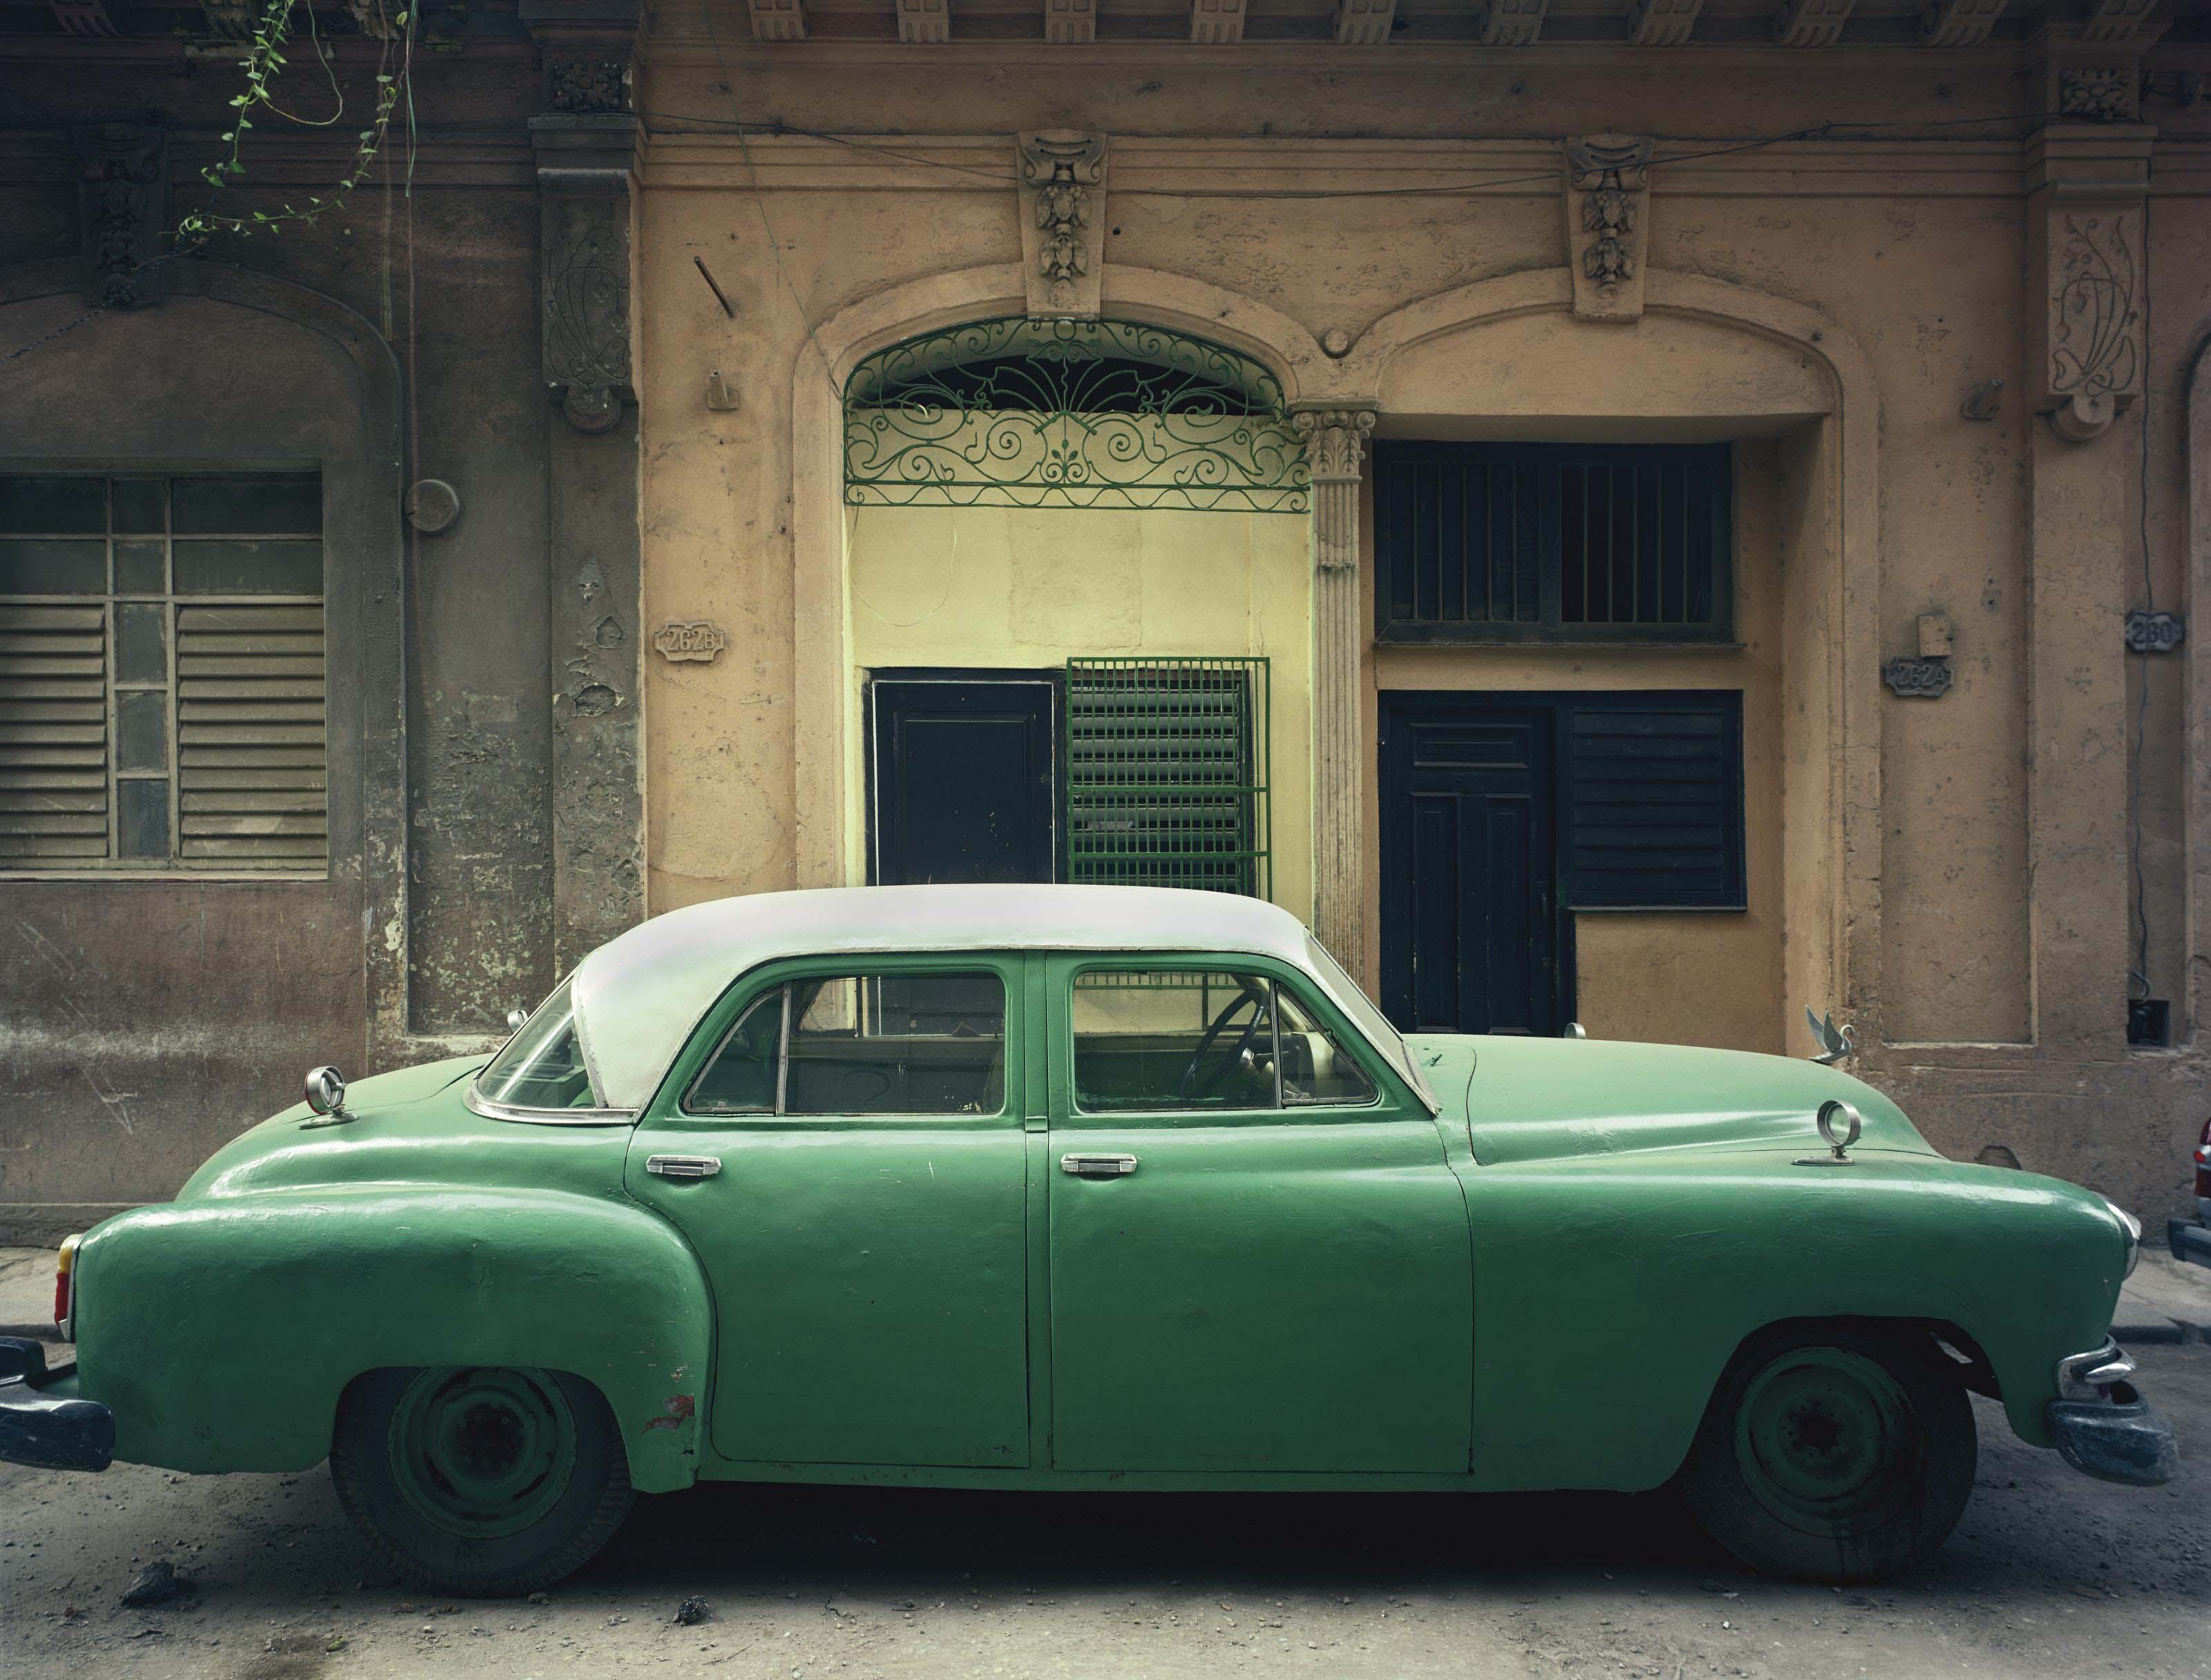 Green Car, 1997